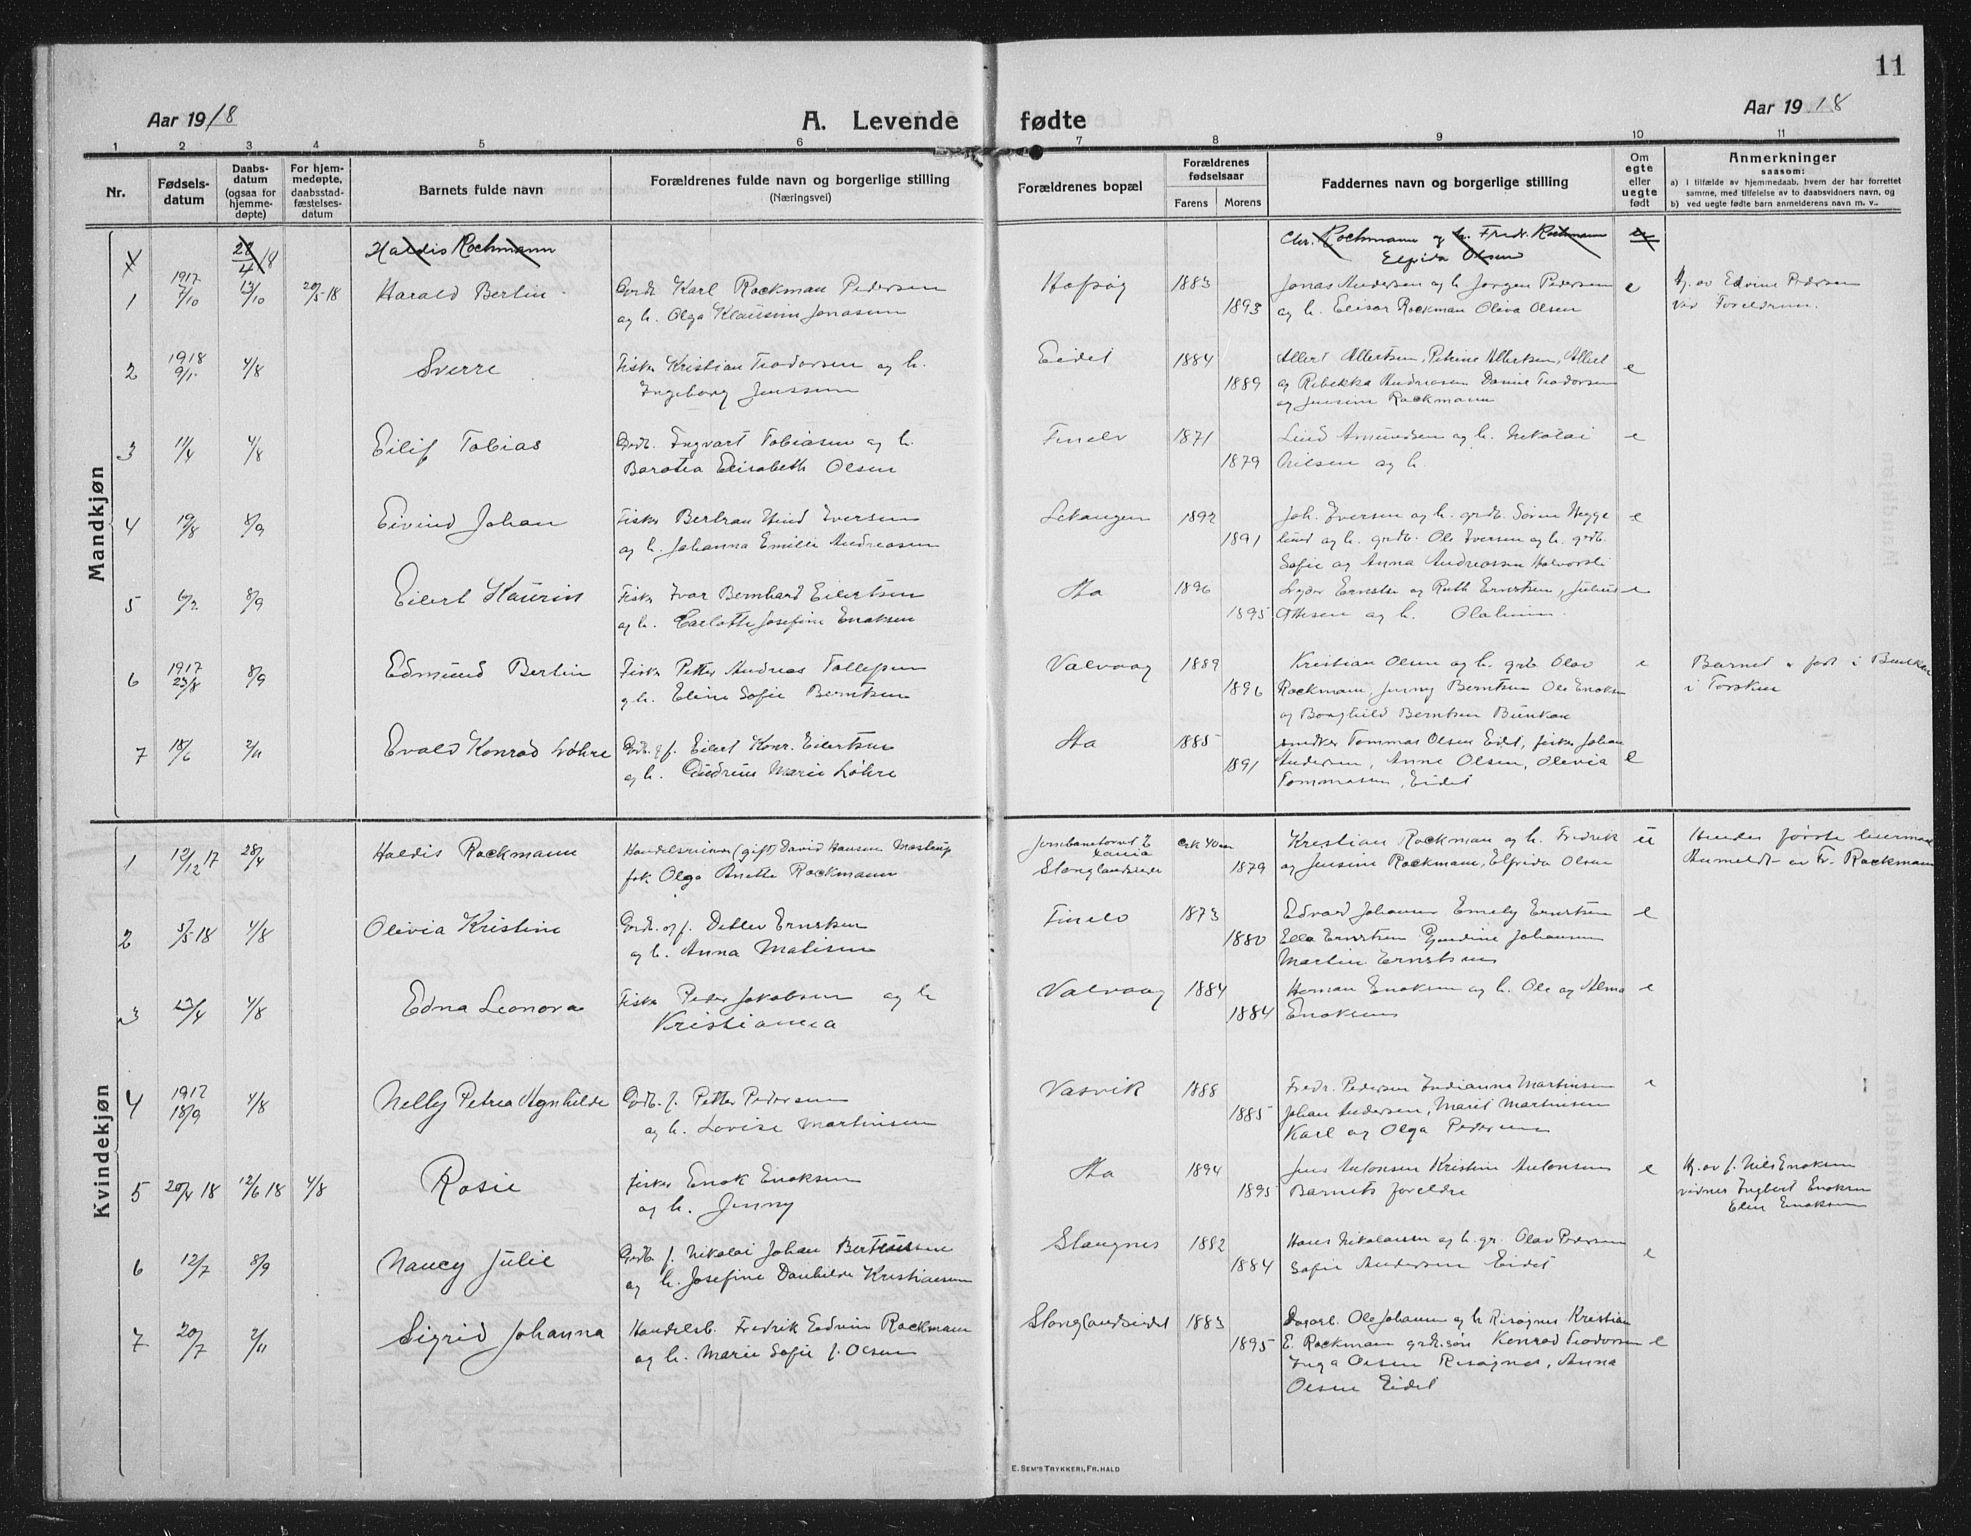 SATØ, Tranøy sokneprestkontor, I/Ia/Iab/L0019klokker: Klokkerbok nr. 19, 1914-1940, s. 11